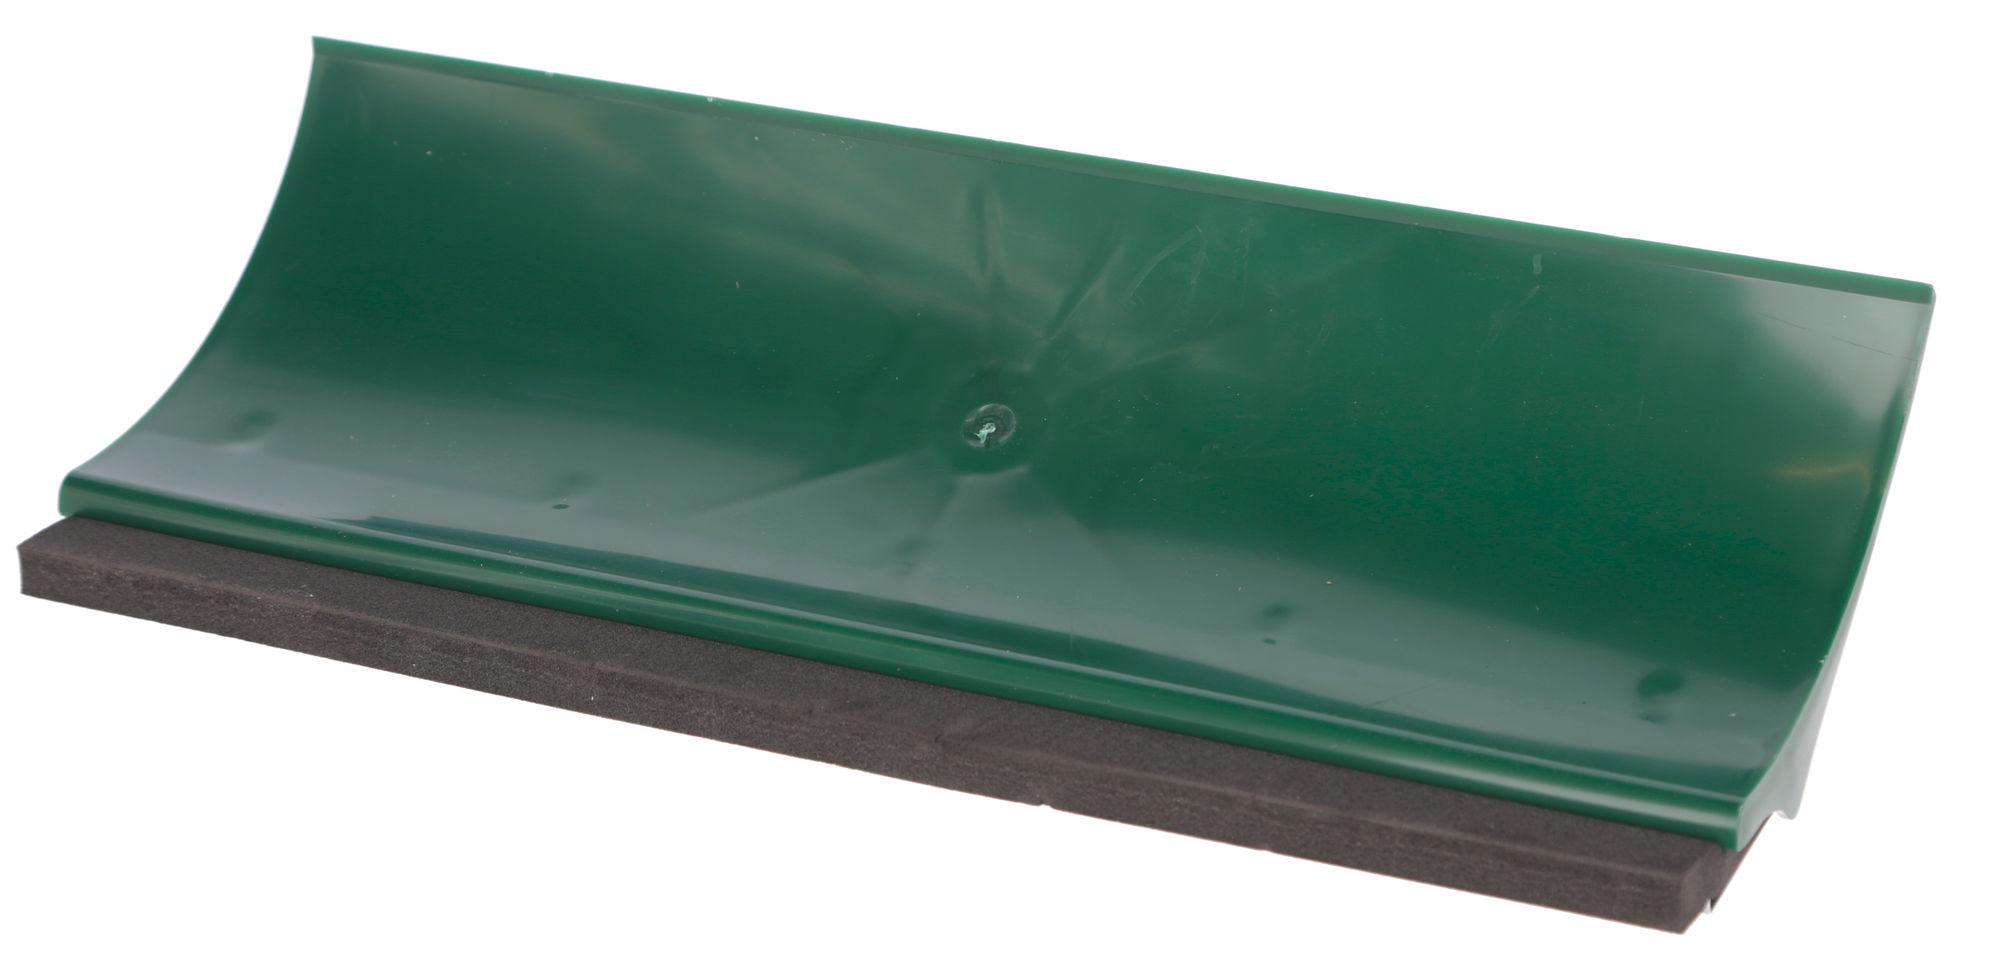 Kot- u. Gülleschieber Kunstst. rechteckig mit Gummilippe 46cm